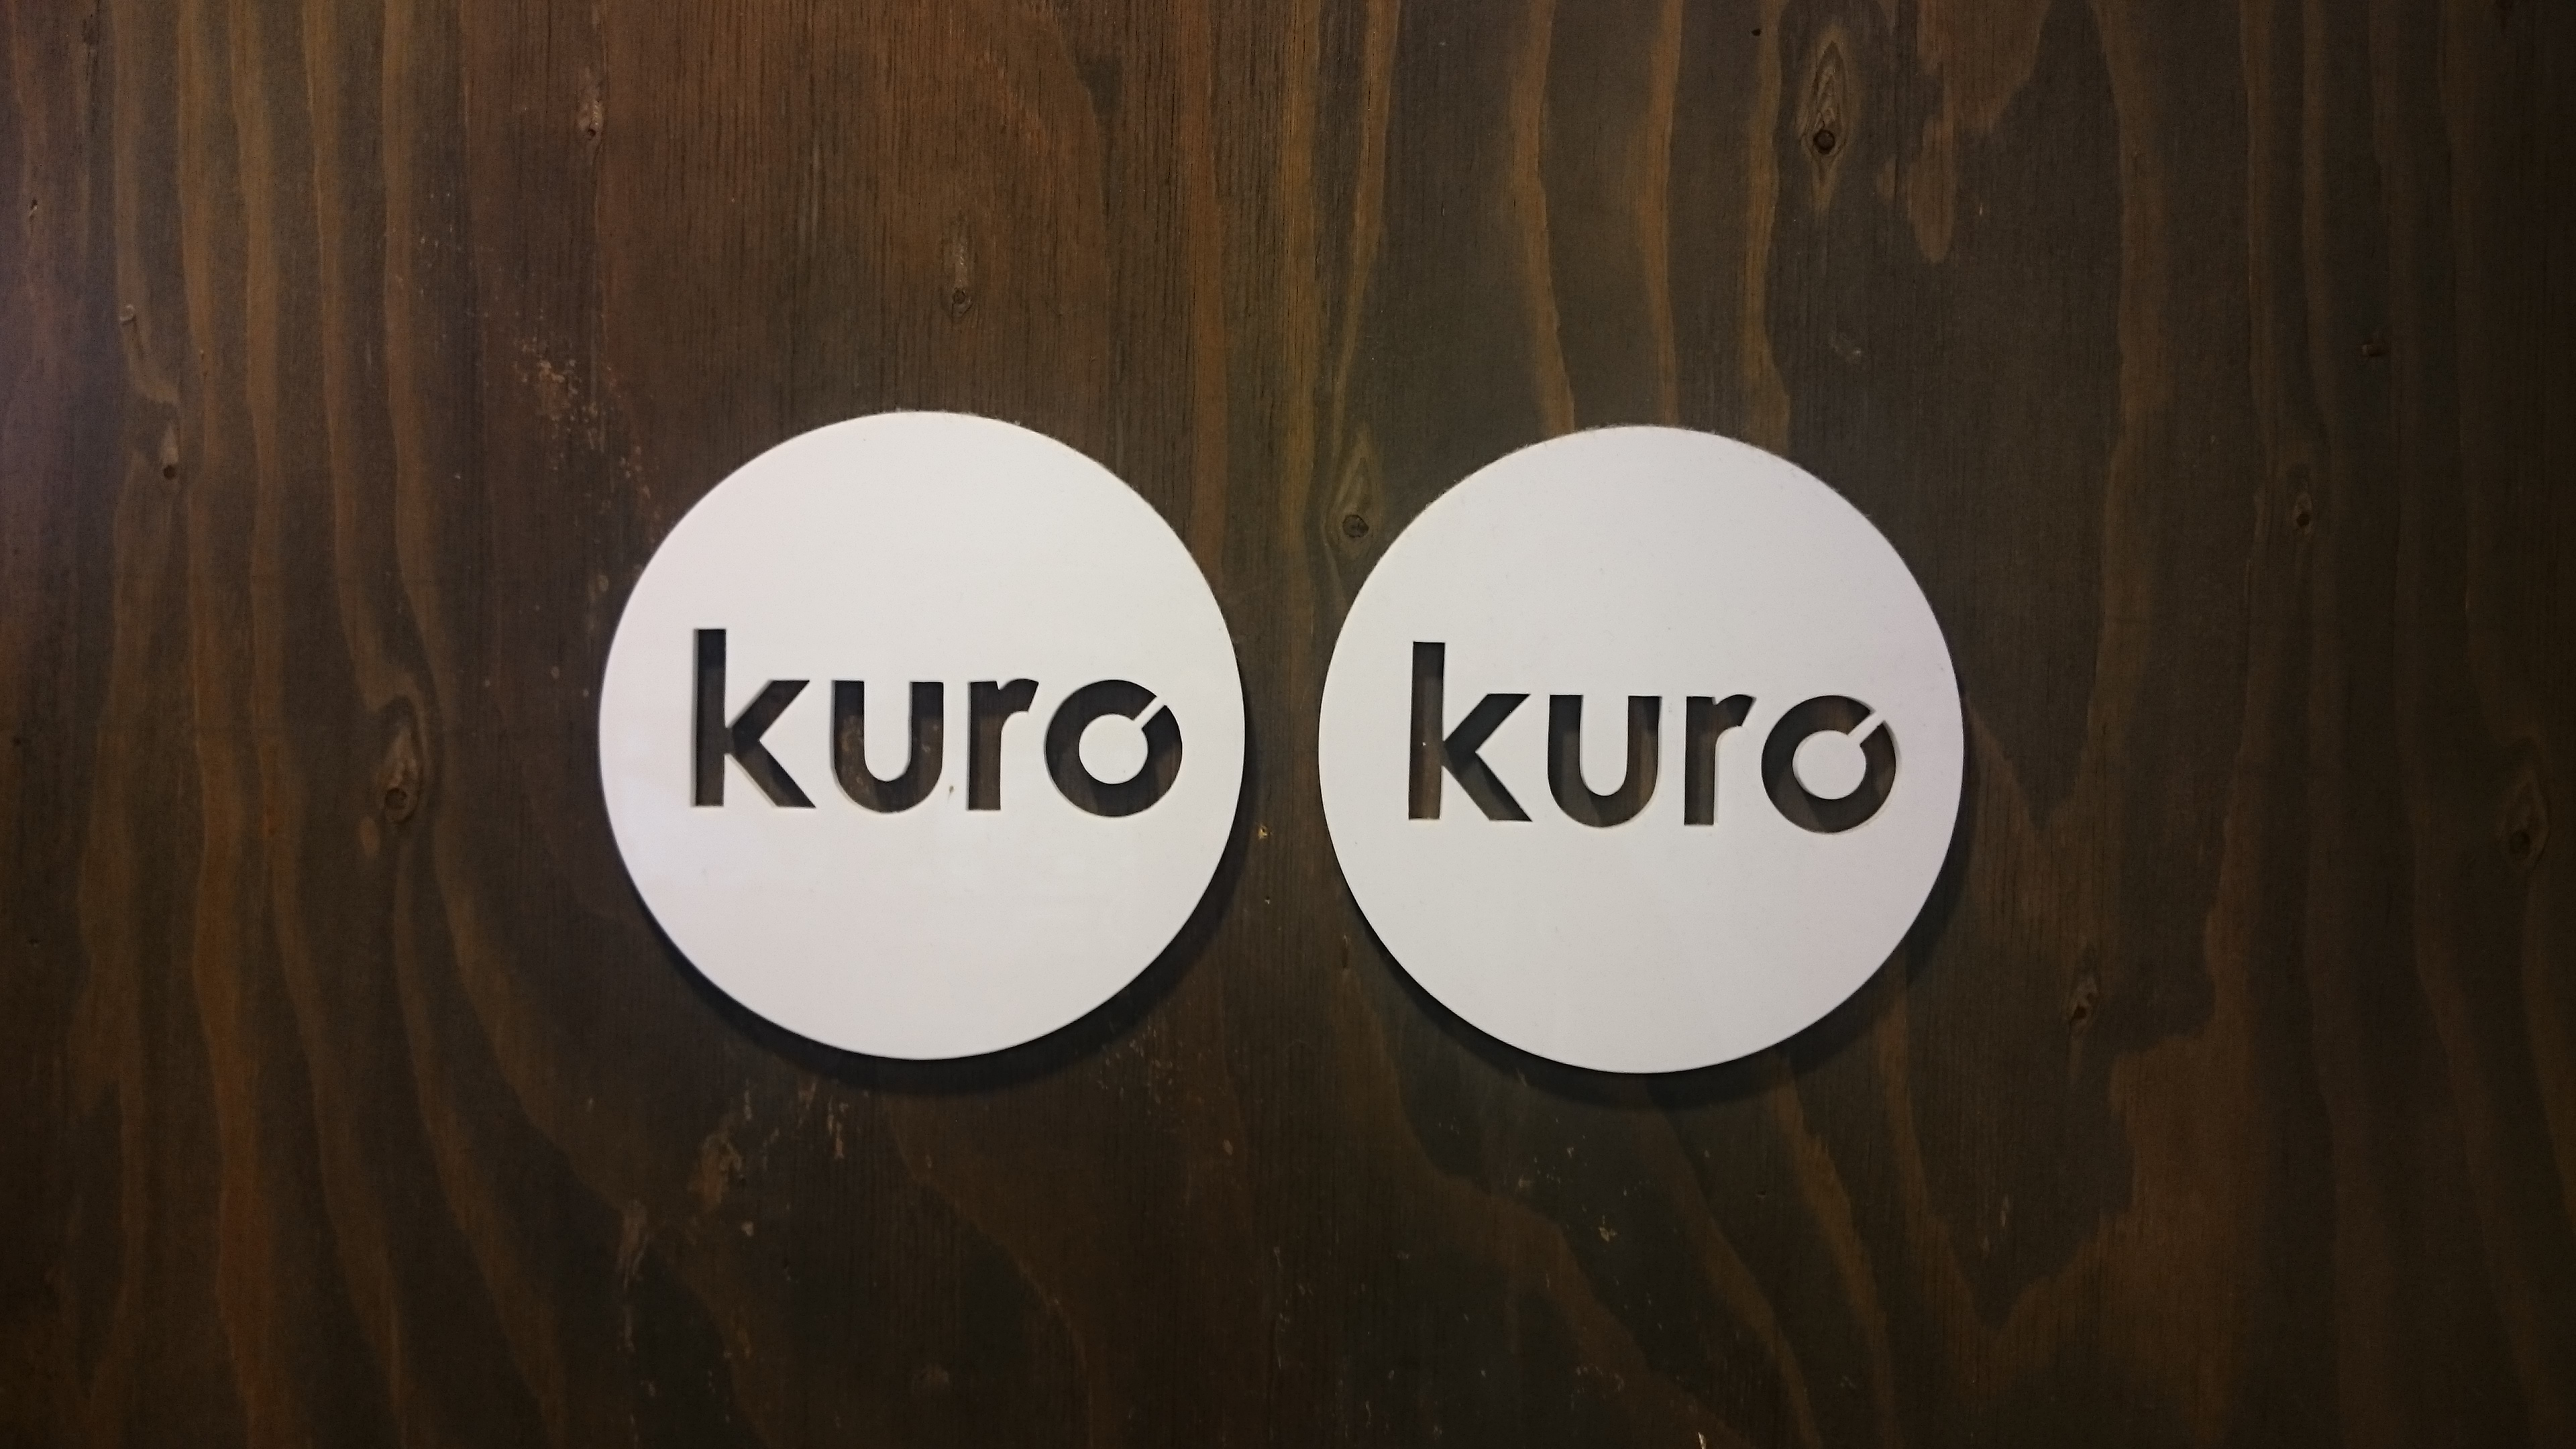 kuro-kuro web store 営業中